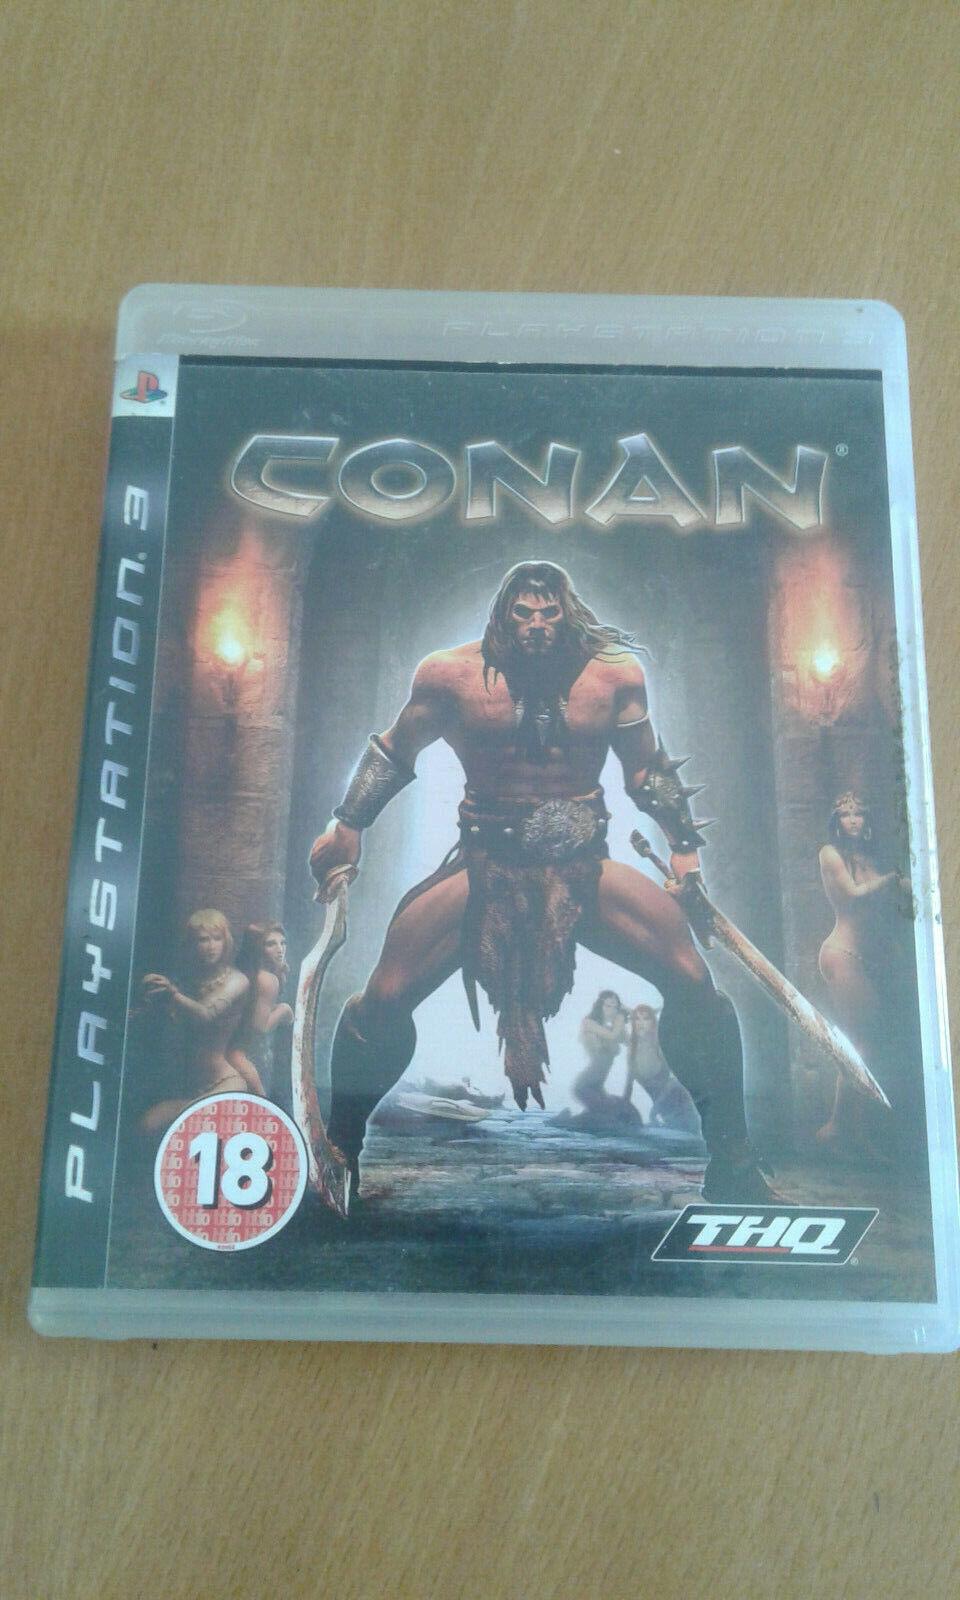 CONAN PS3 ORIGINAL USED GAME PLAYSTATION 3 GAME FREE SHIPPING